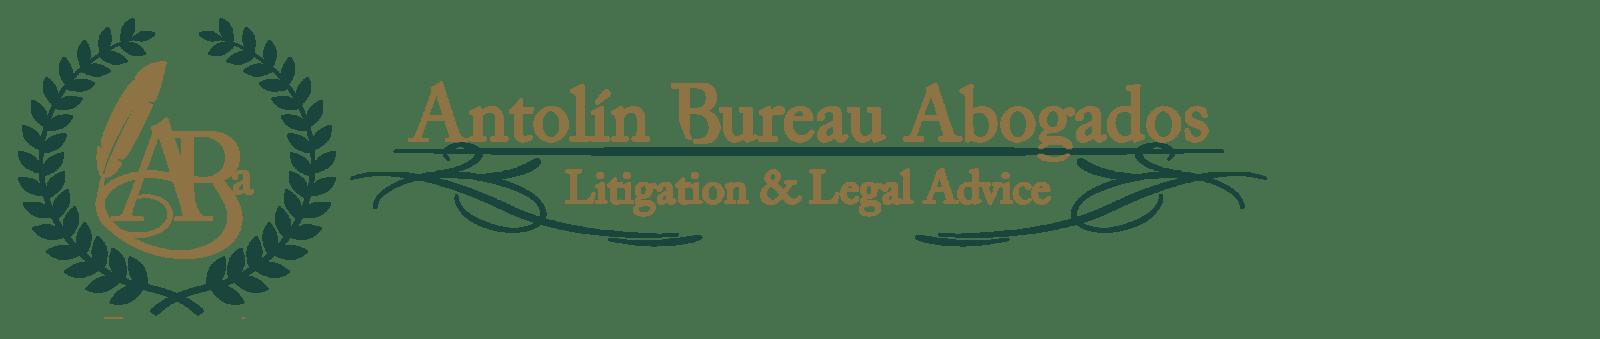 Antolín Bureau Abogados